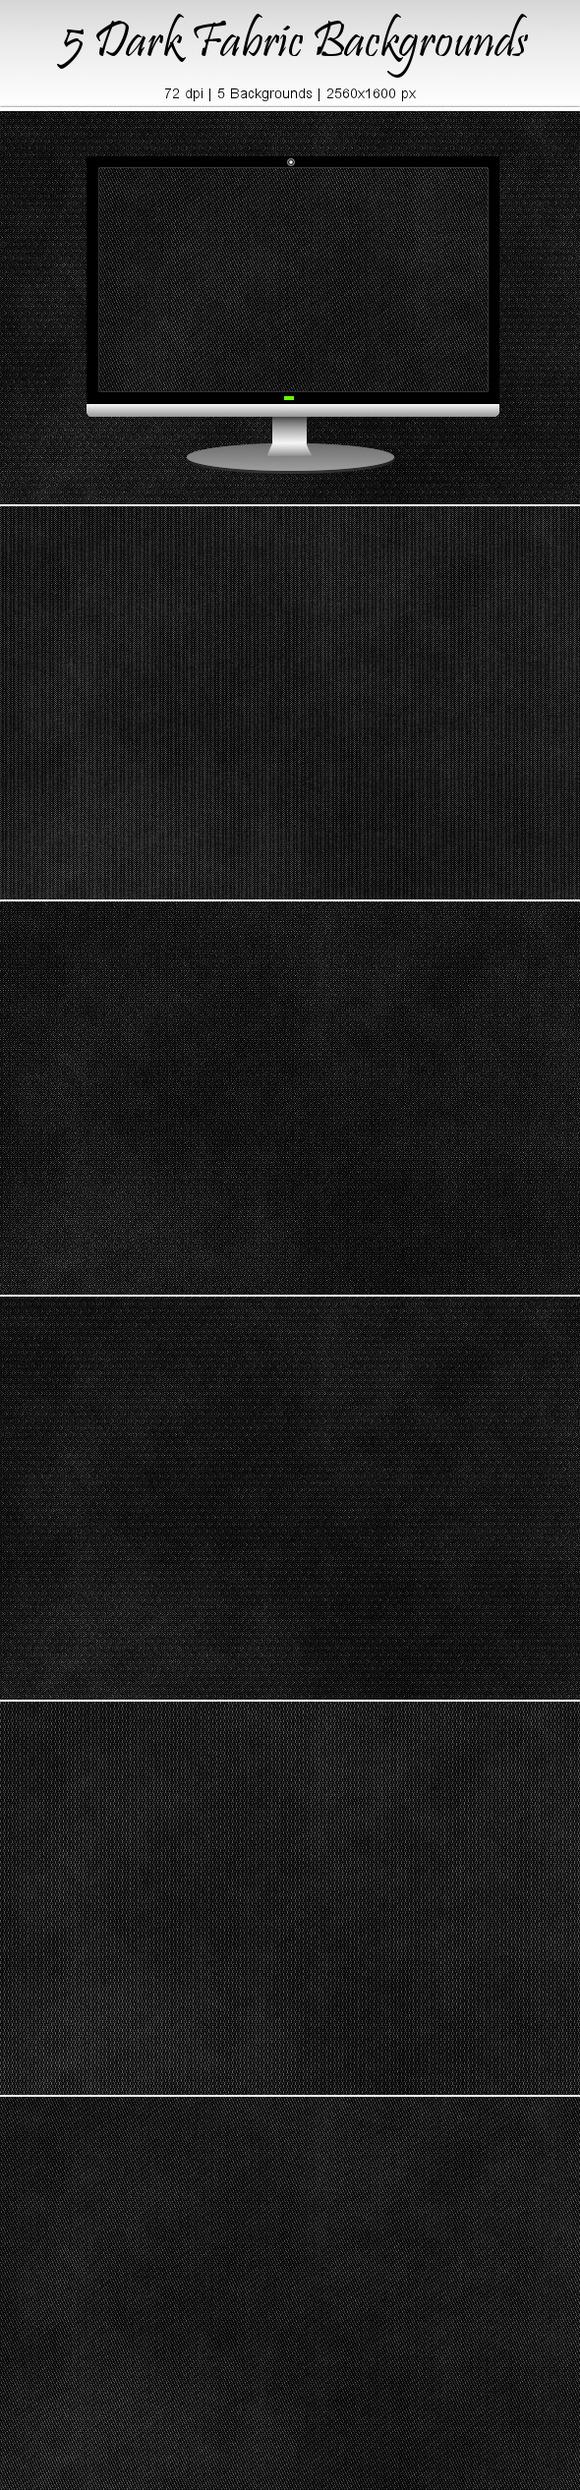 5 Dark Fabric Backgrounds